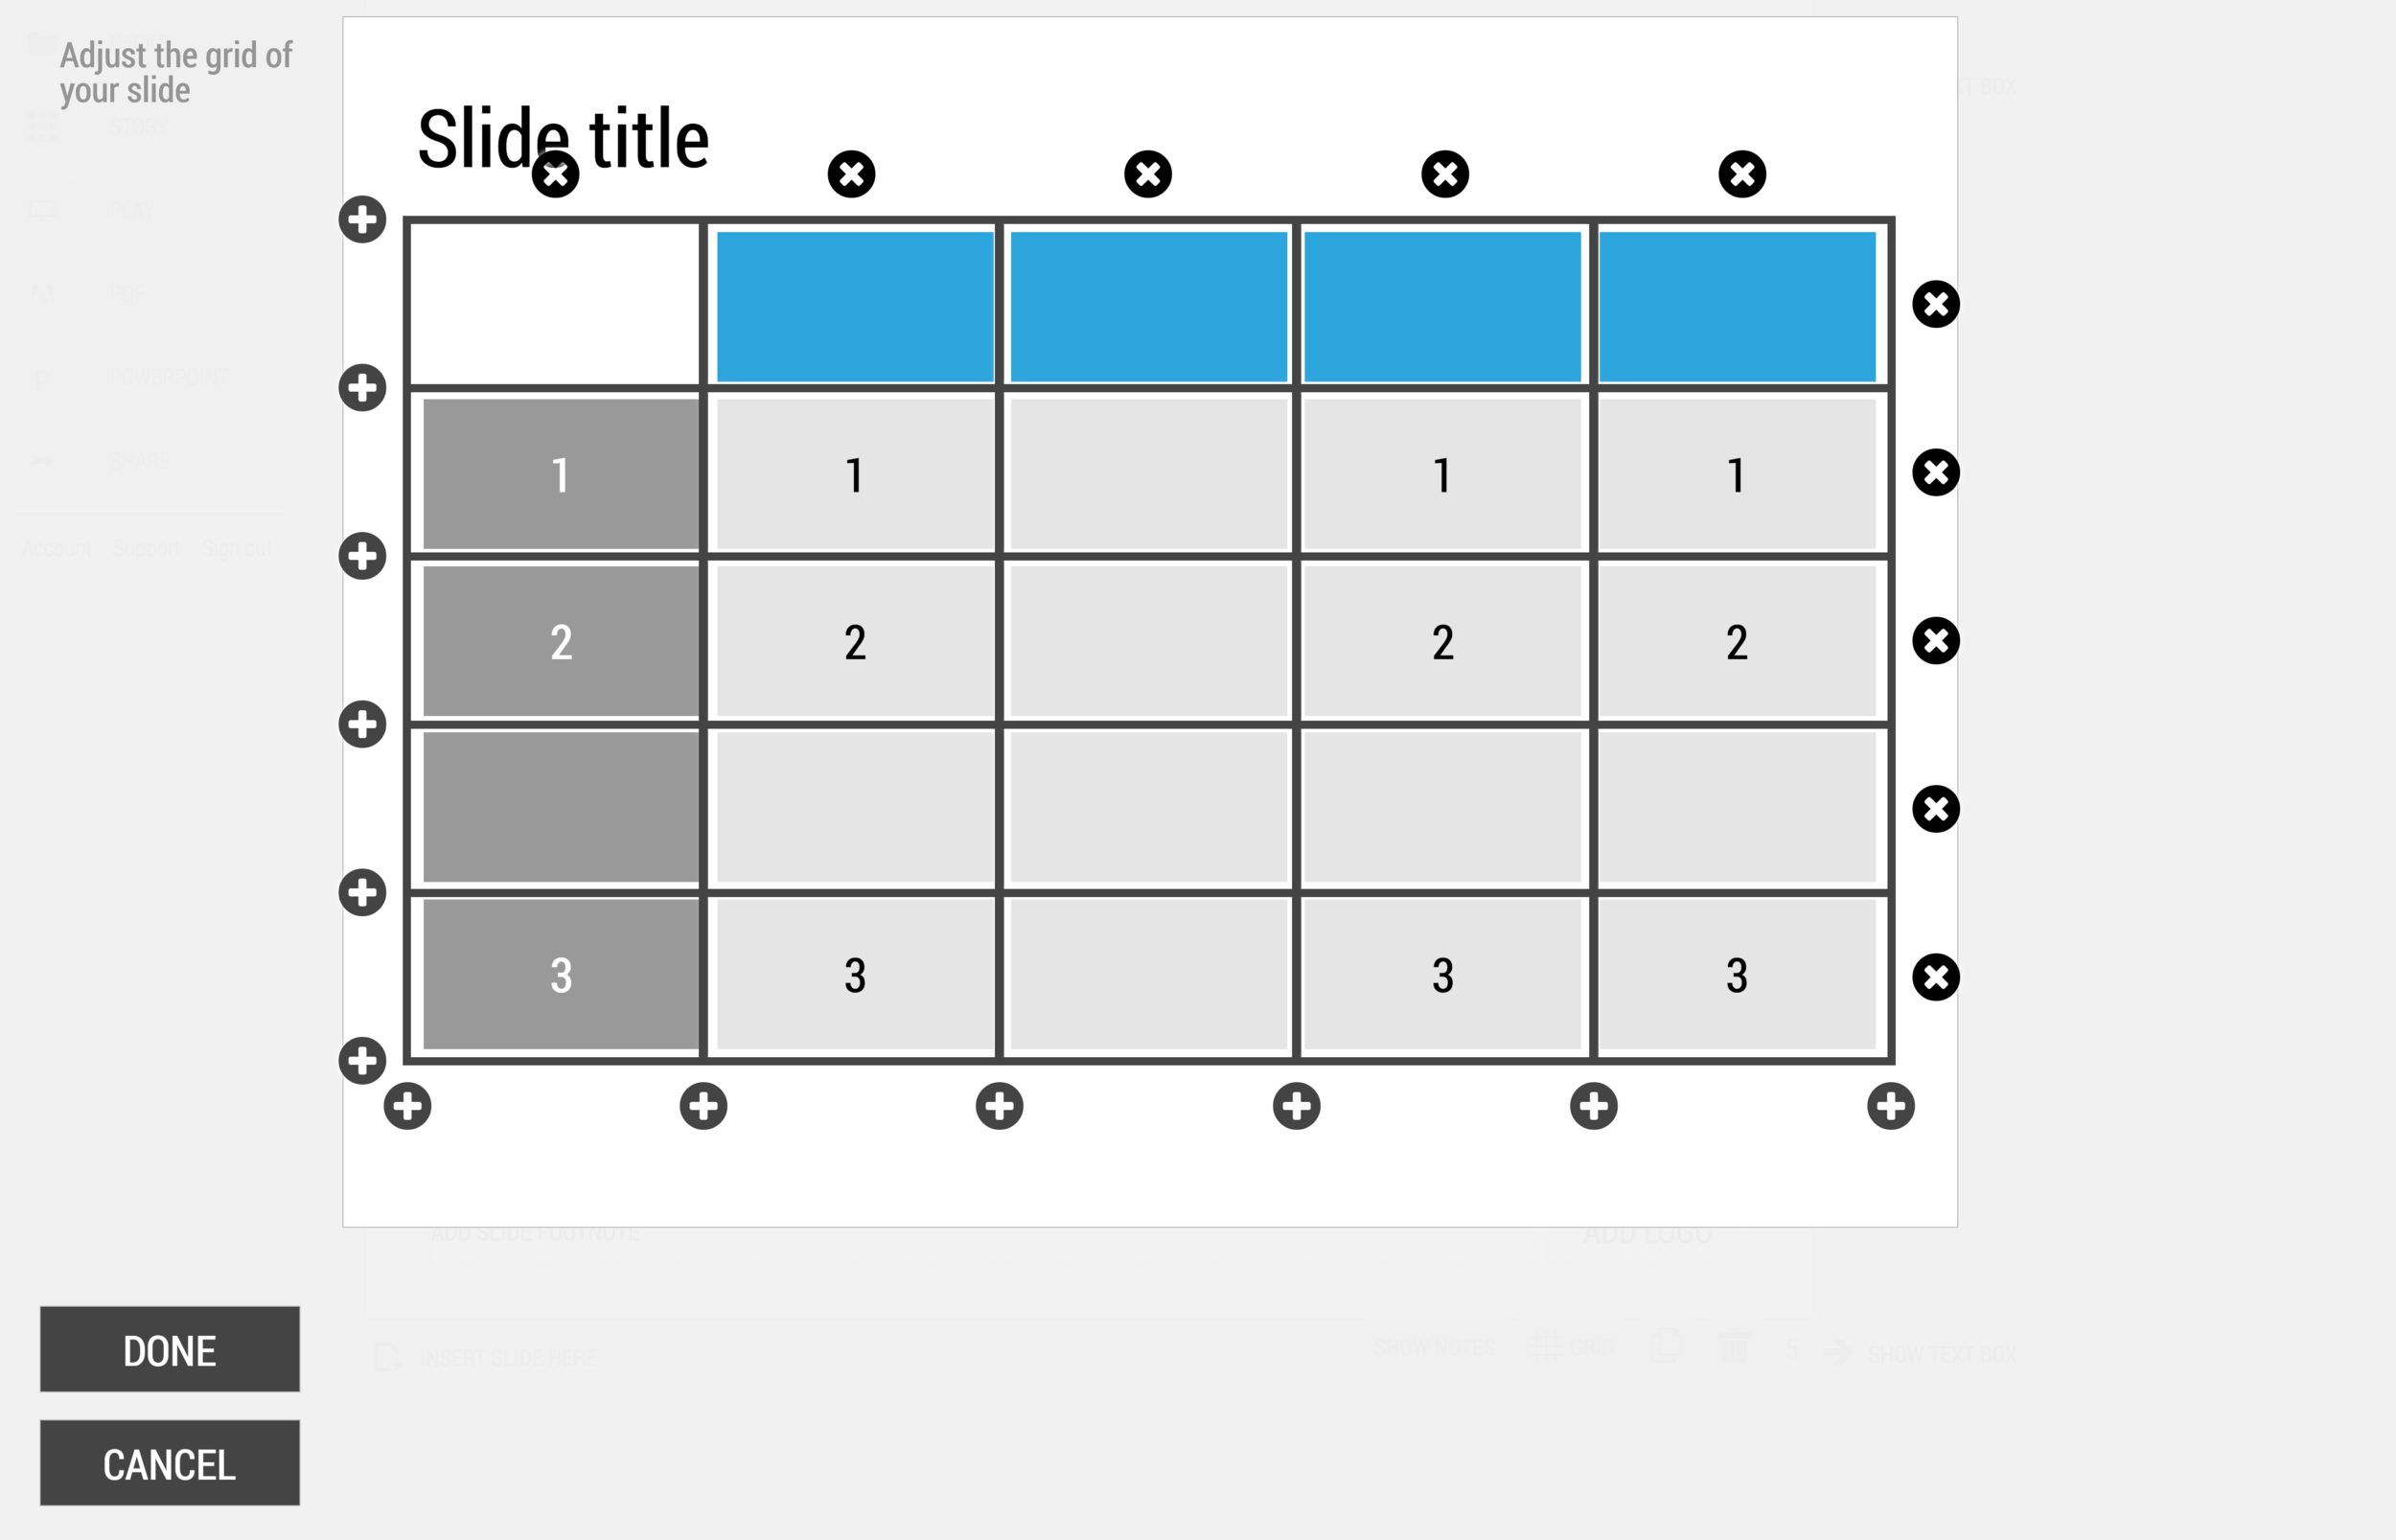 3) Add a row and a column